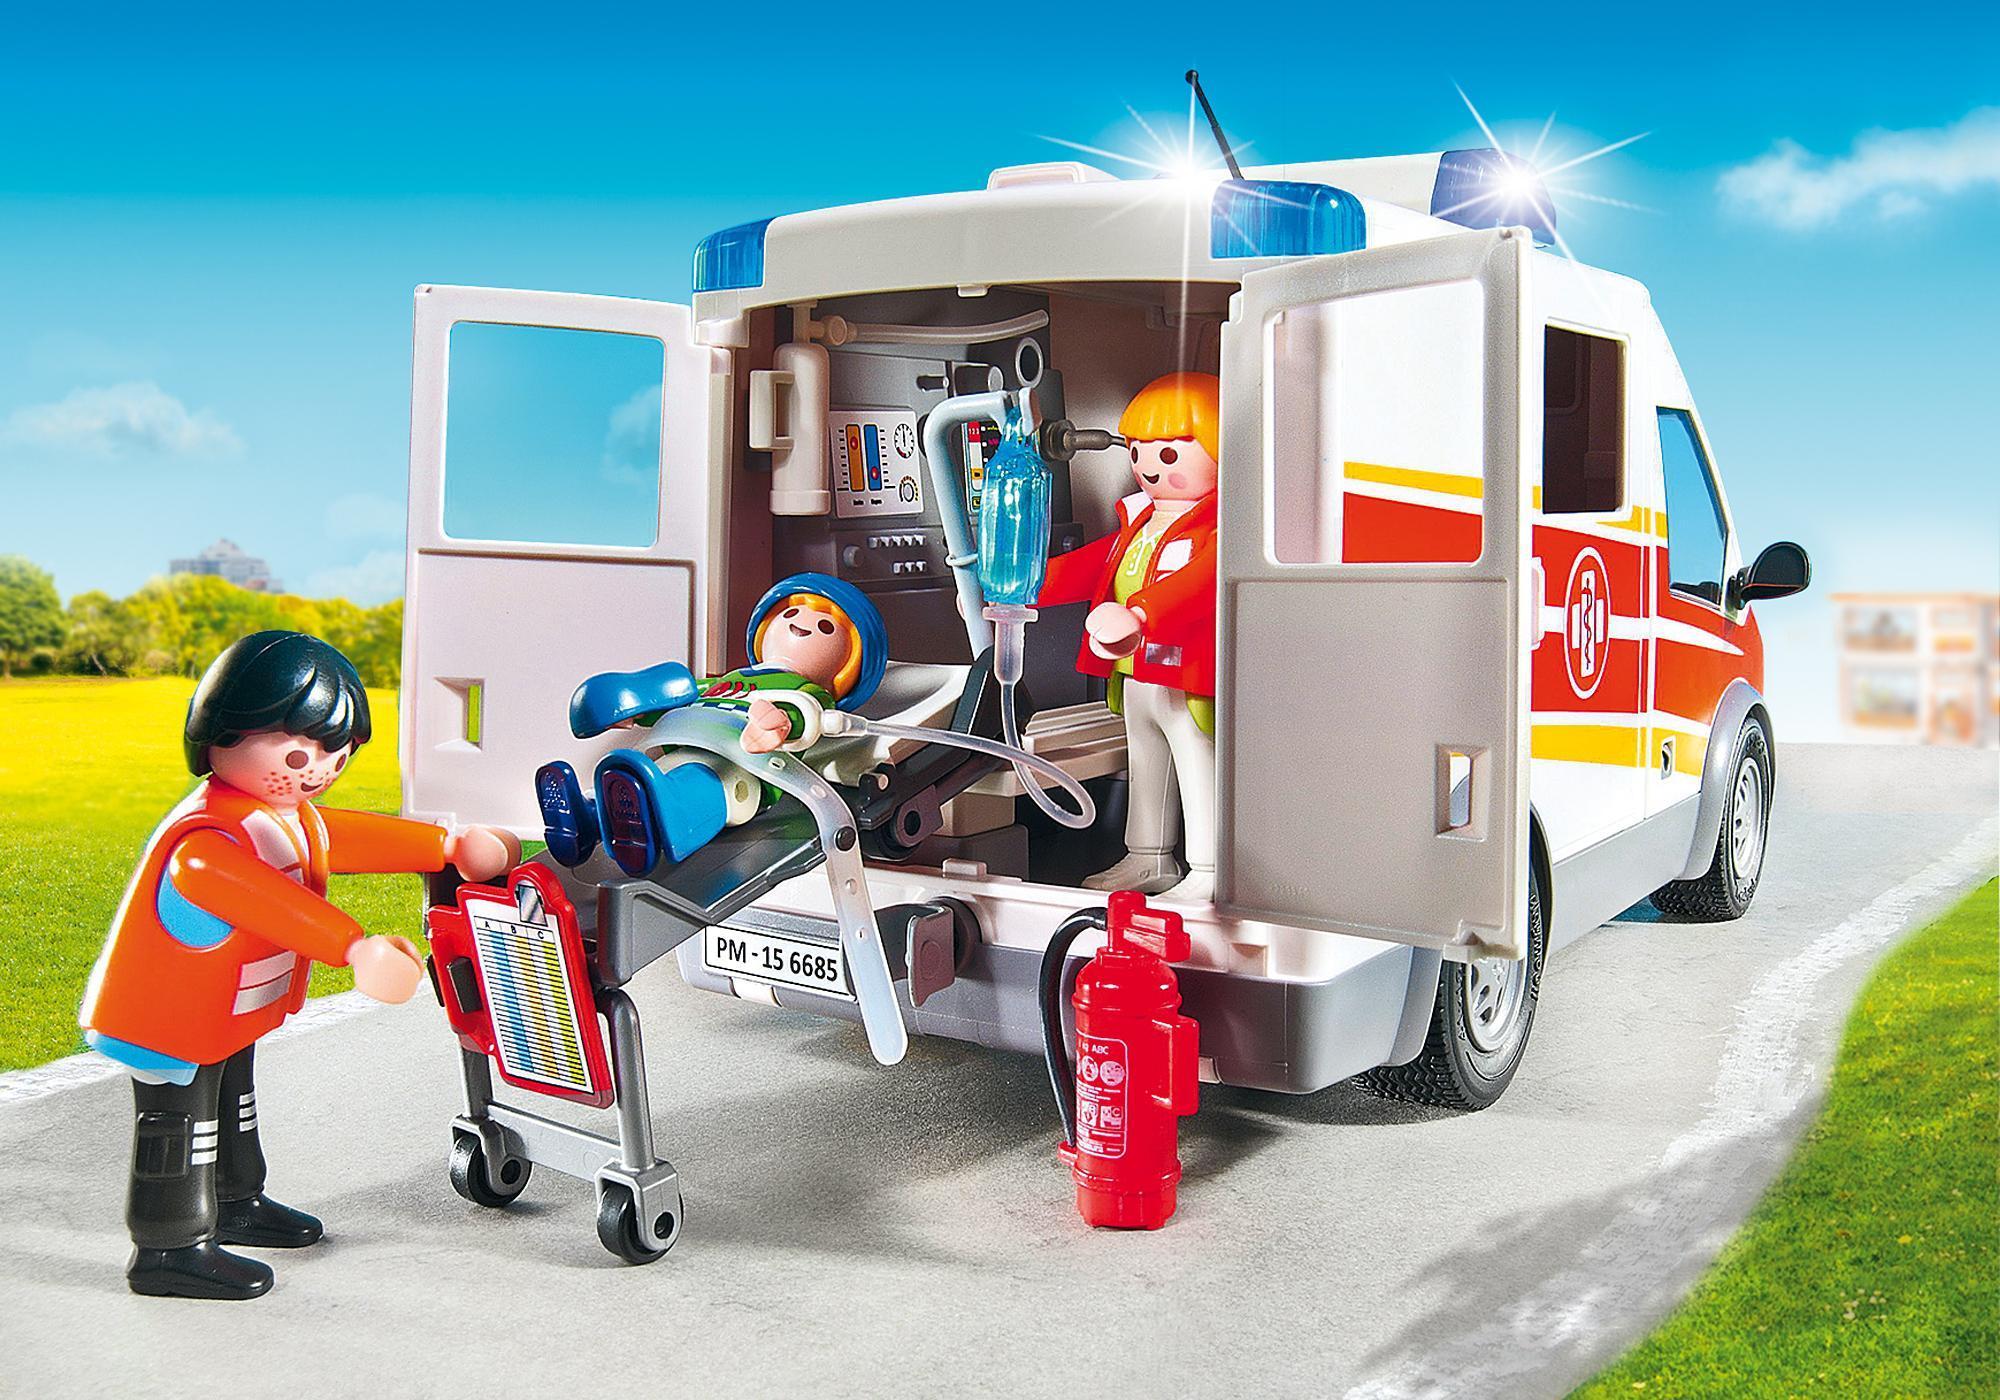 http://media.playmobil.com/i/playmobil/6685_product_extra2/Ambulance avec gyrophare et sirène